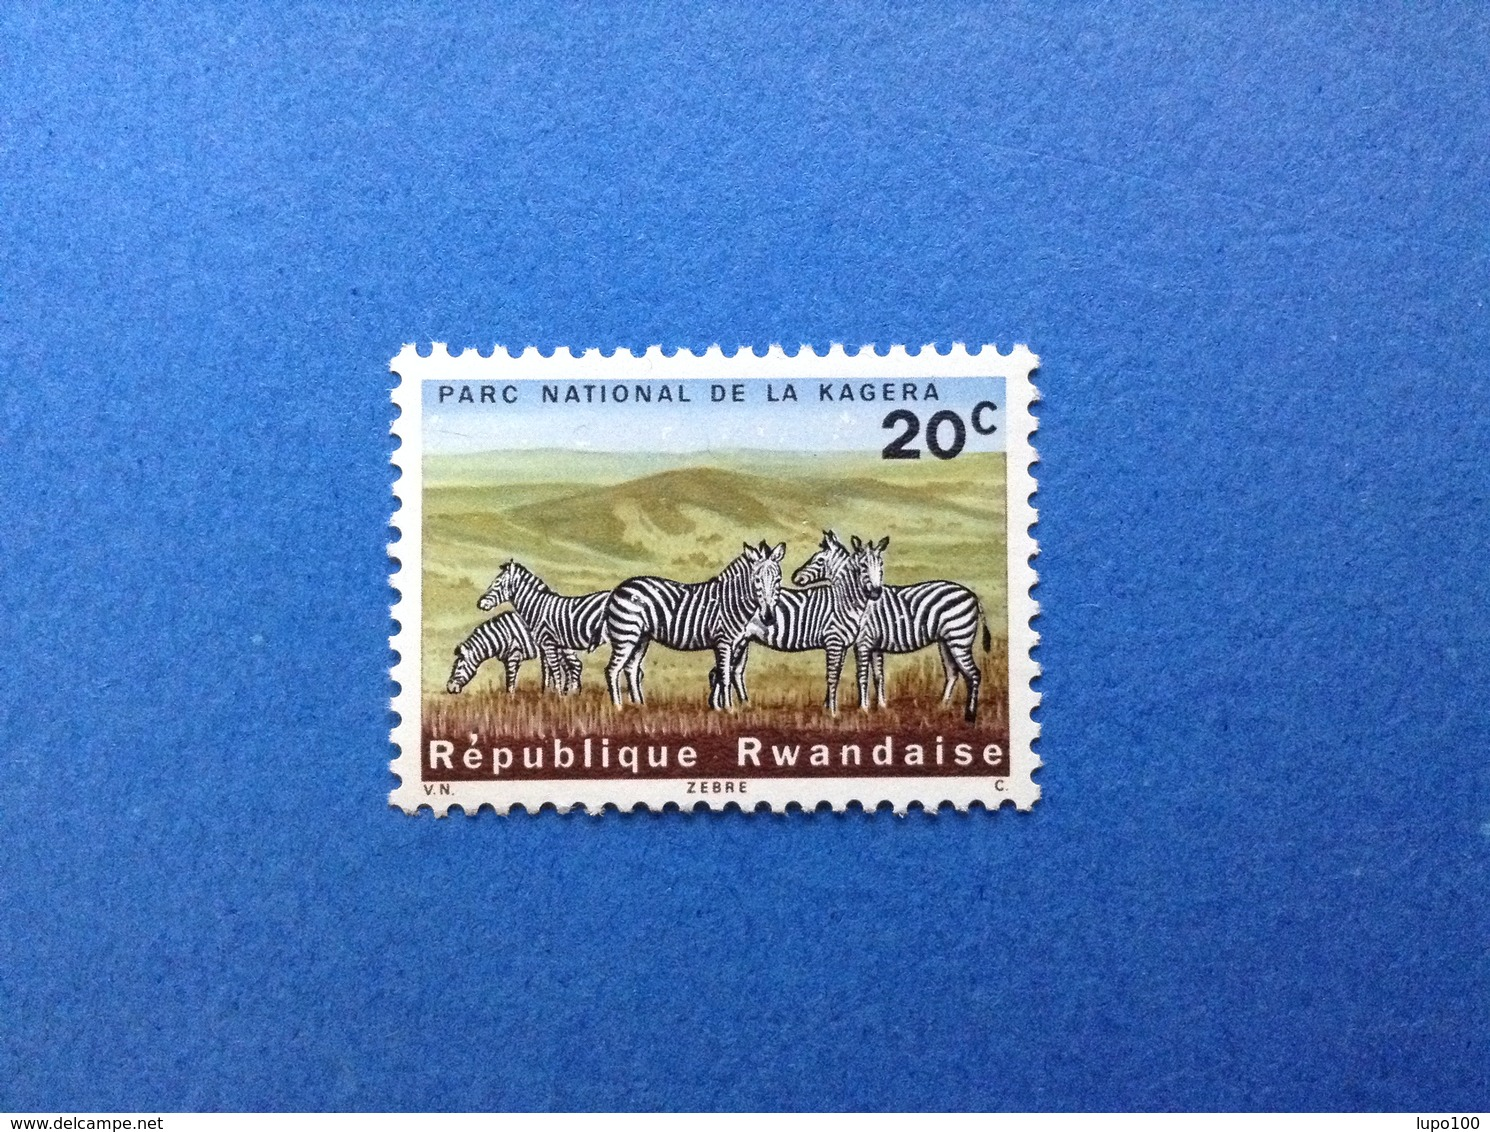 RWANDA REPUBLIQUE RWANDAISE PARCO NAZIONALE KAGERA ANIMALI FAUNA ZEBRE 20 C FRANCOBOLLO NUOVO STAMP NEW MNH** - Rwanda